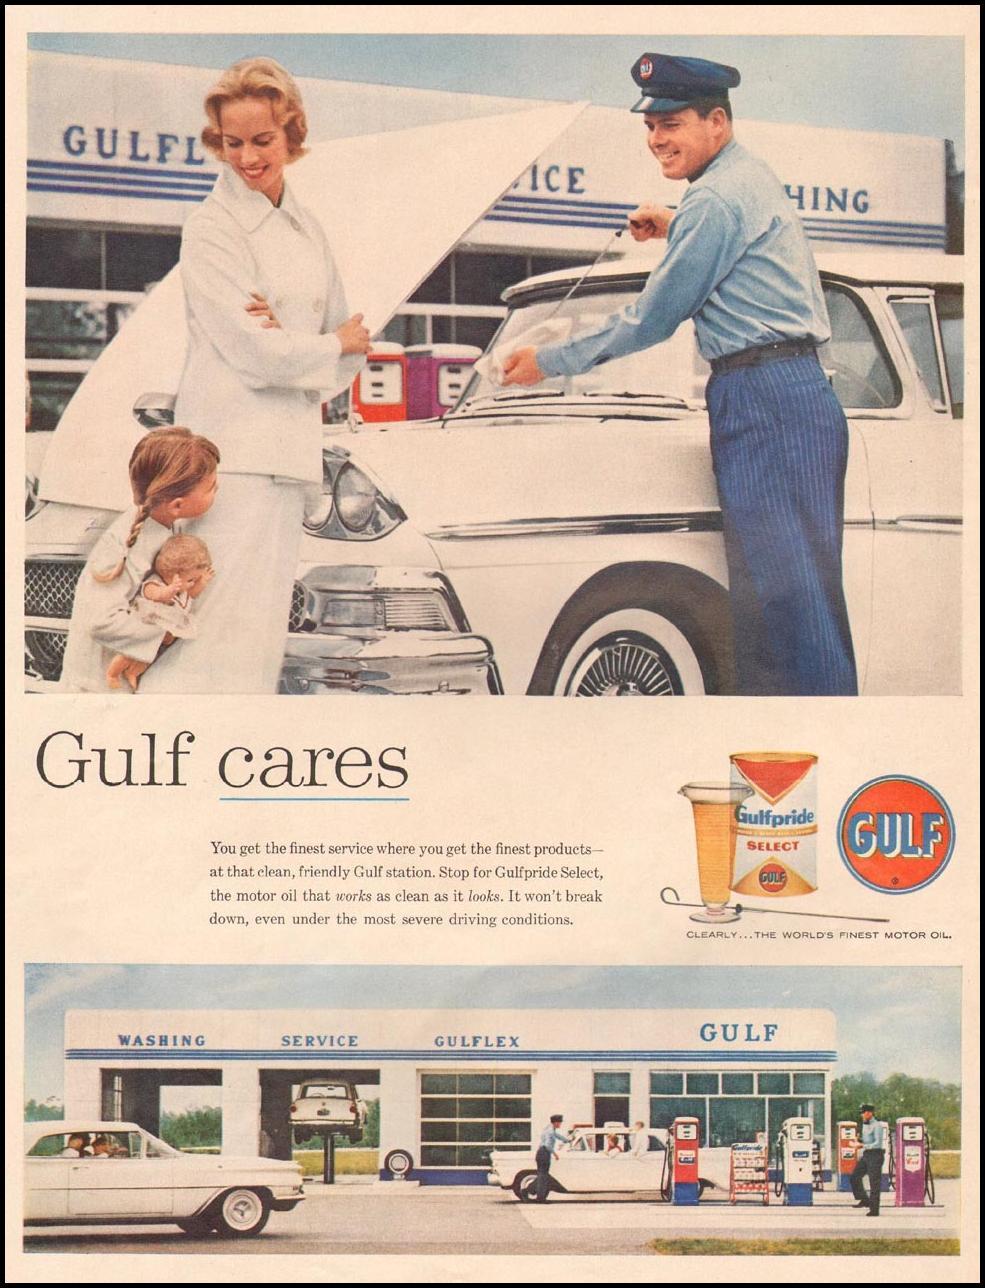 GULFPRIDE MOTOR OIL LIFE 08/10/1959